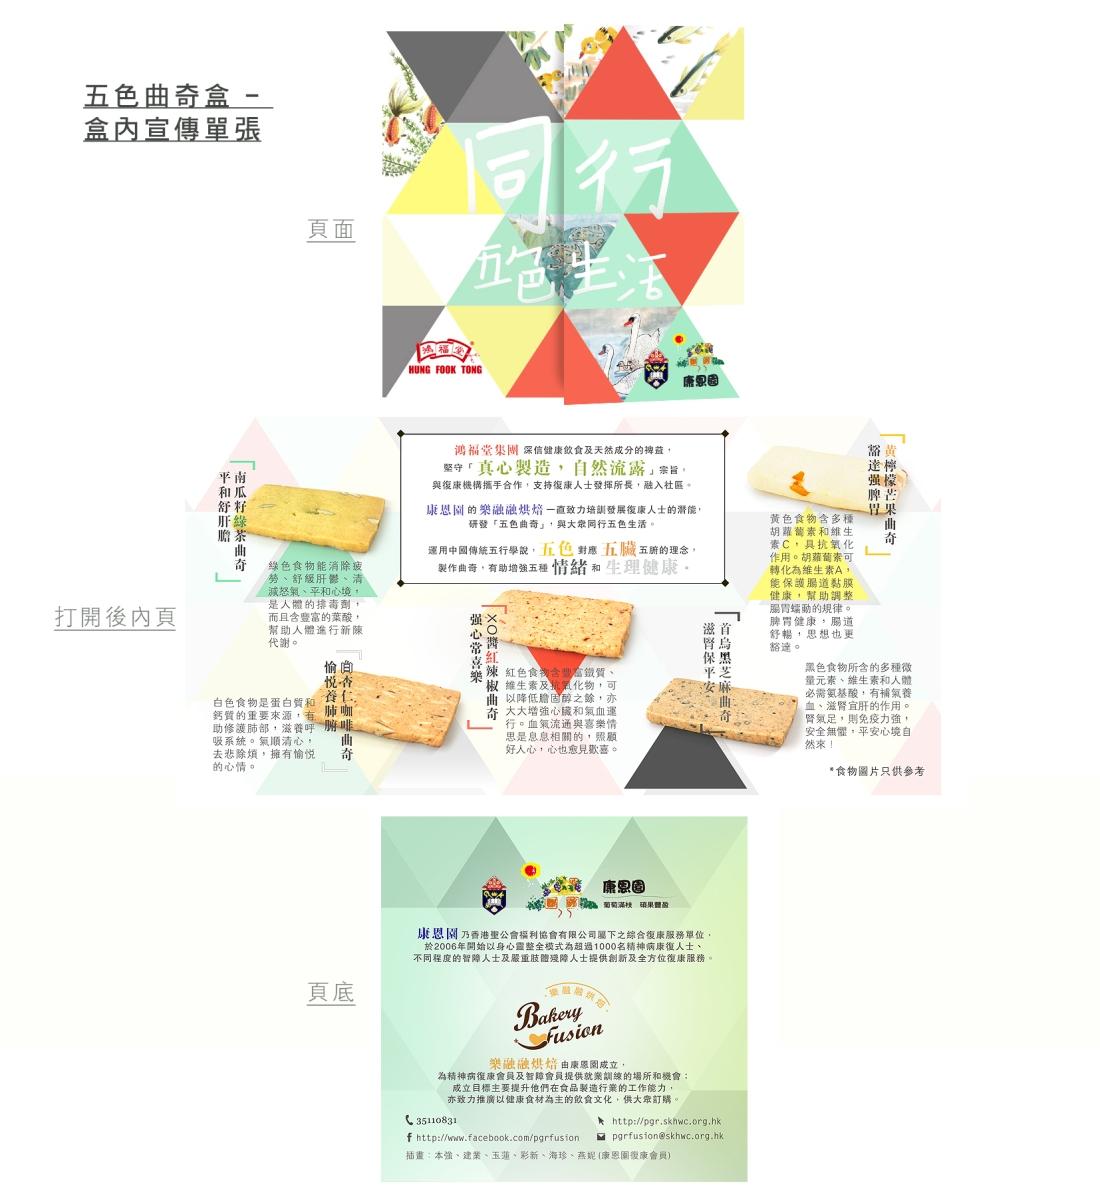 hungfooktong_leaflet_20140811